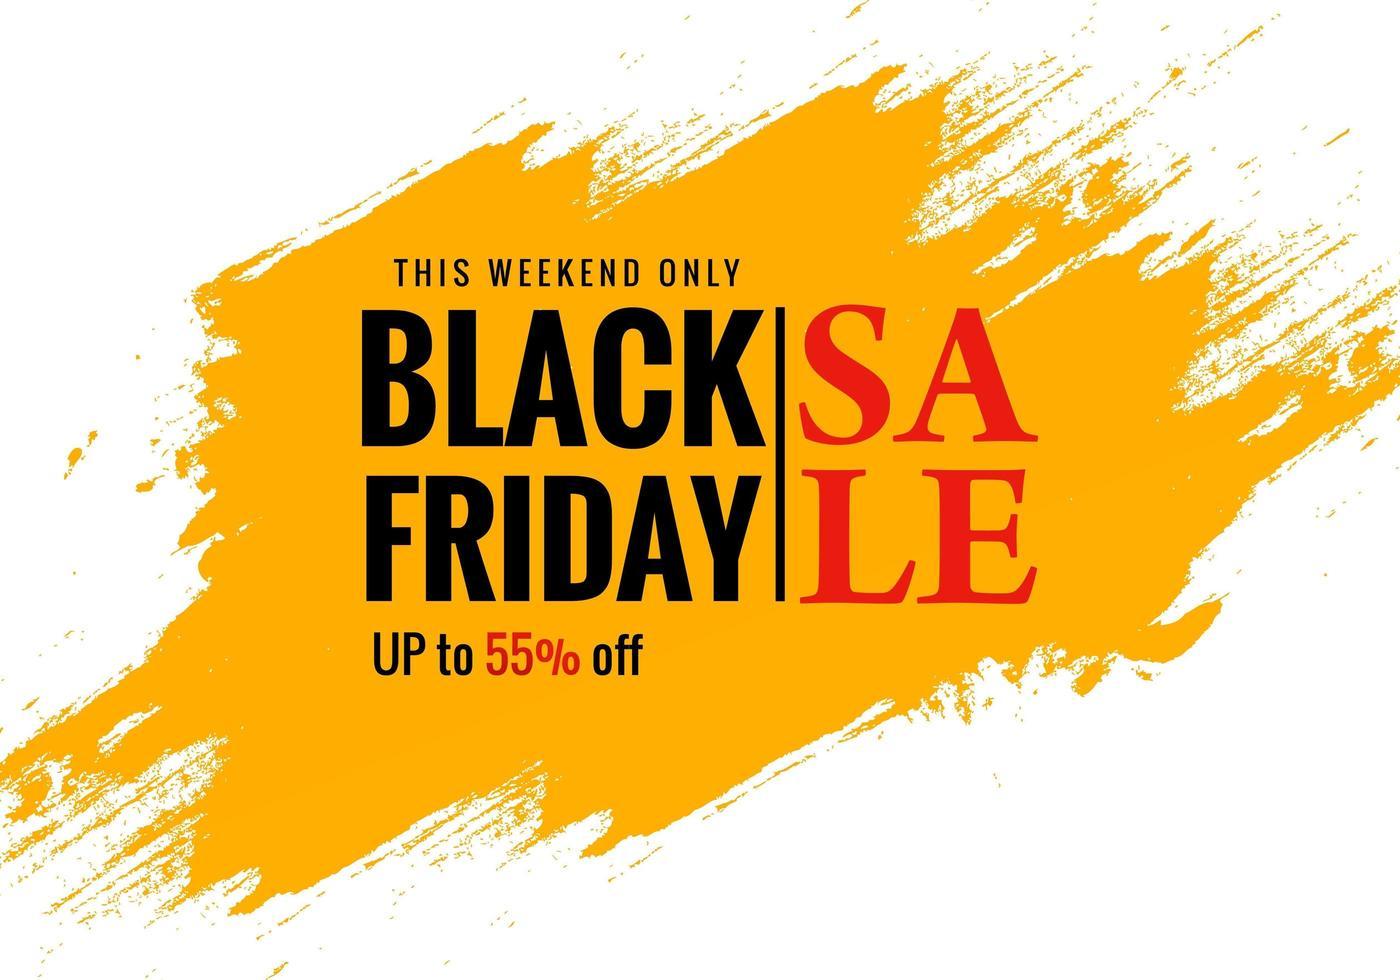 Black Friday exklusives Verkaufsplakat für Pinsel Banner Design vektor